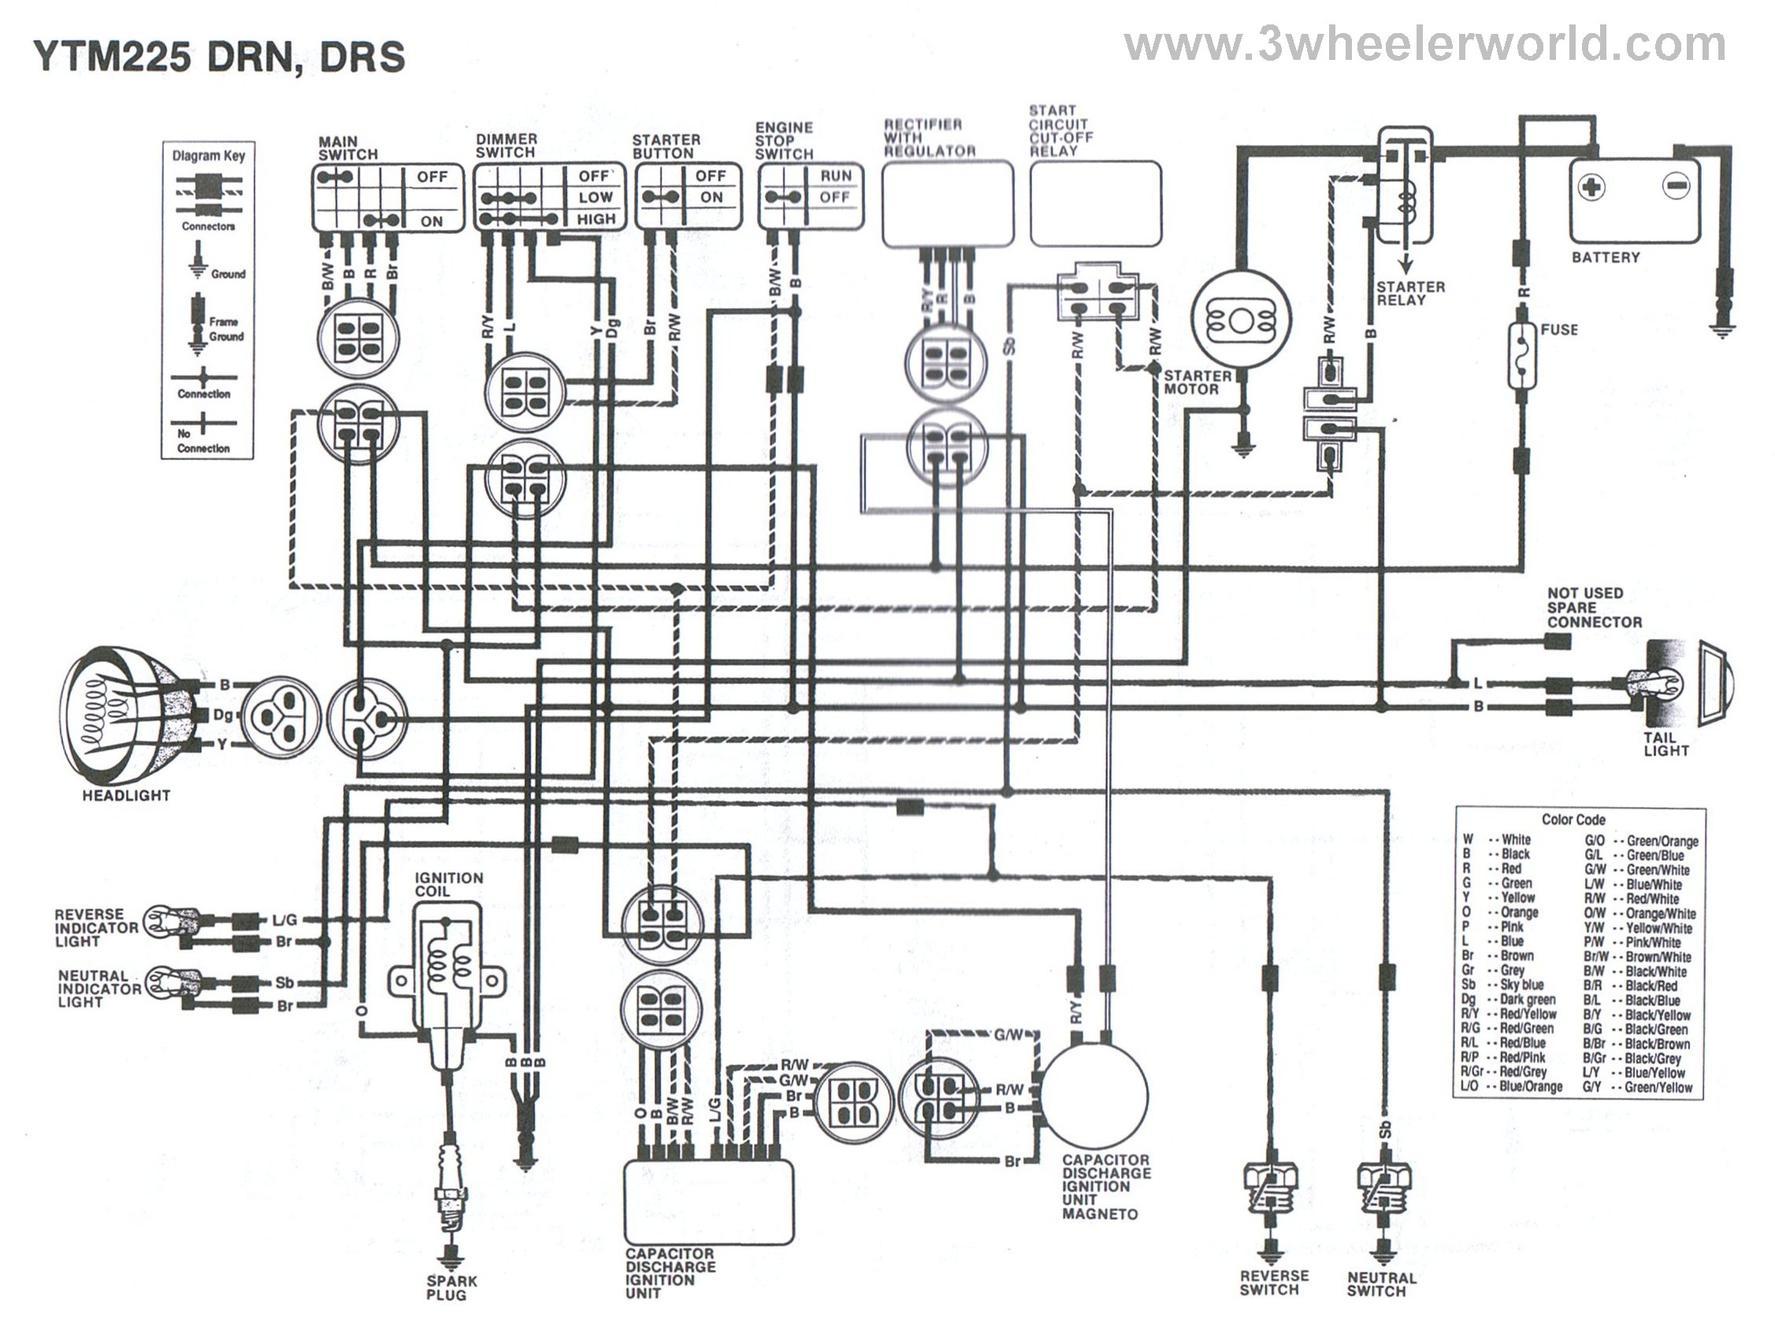 1996 Yamaha Kodiak Wiring Diagram – Wirdig